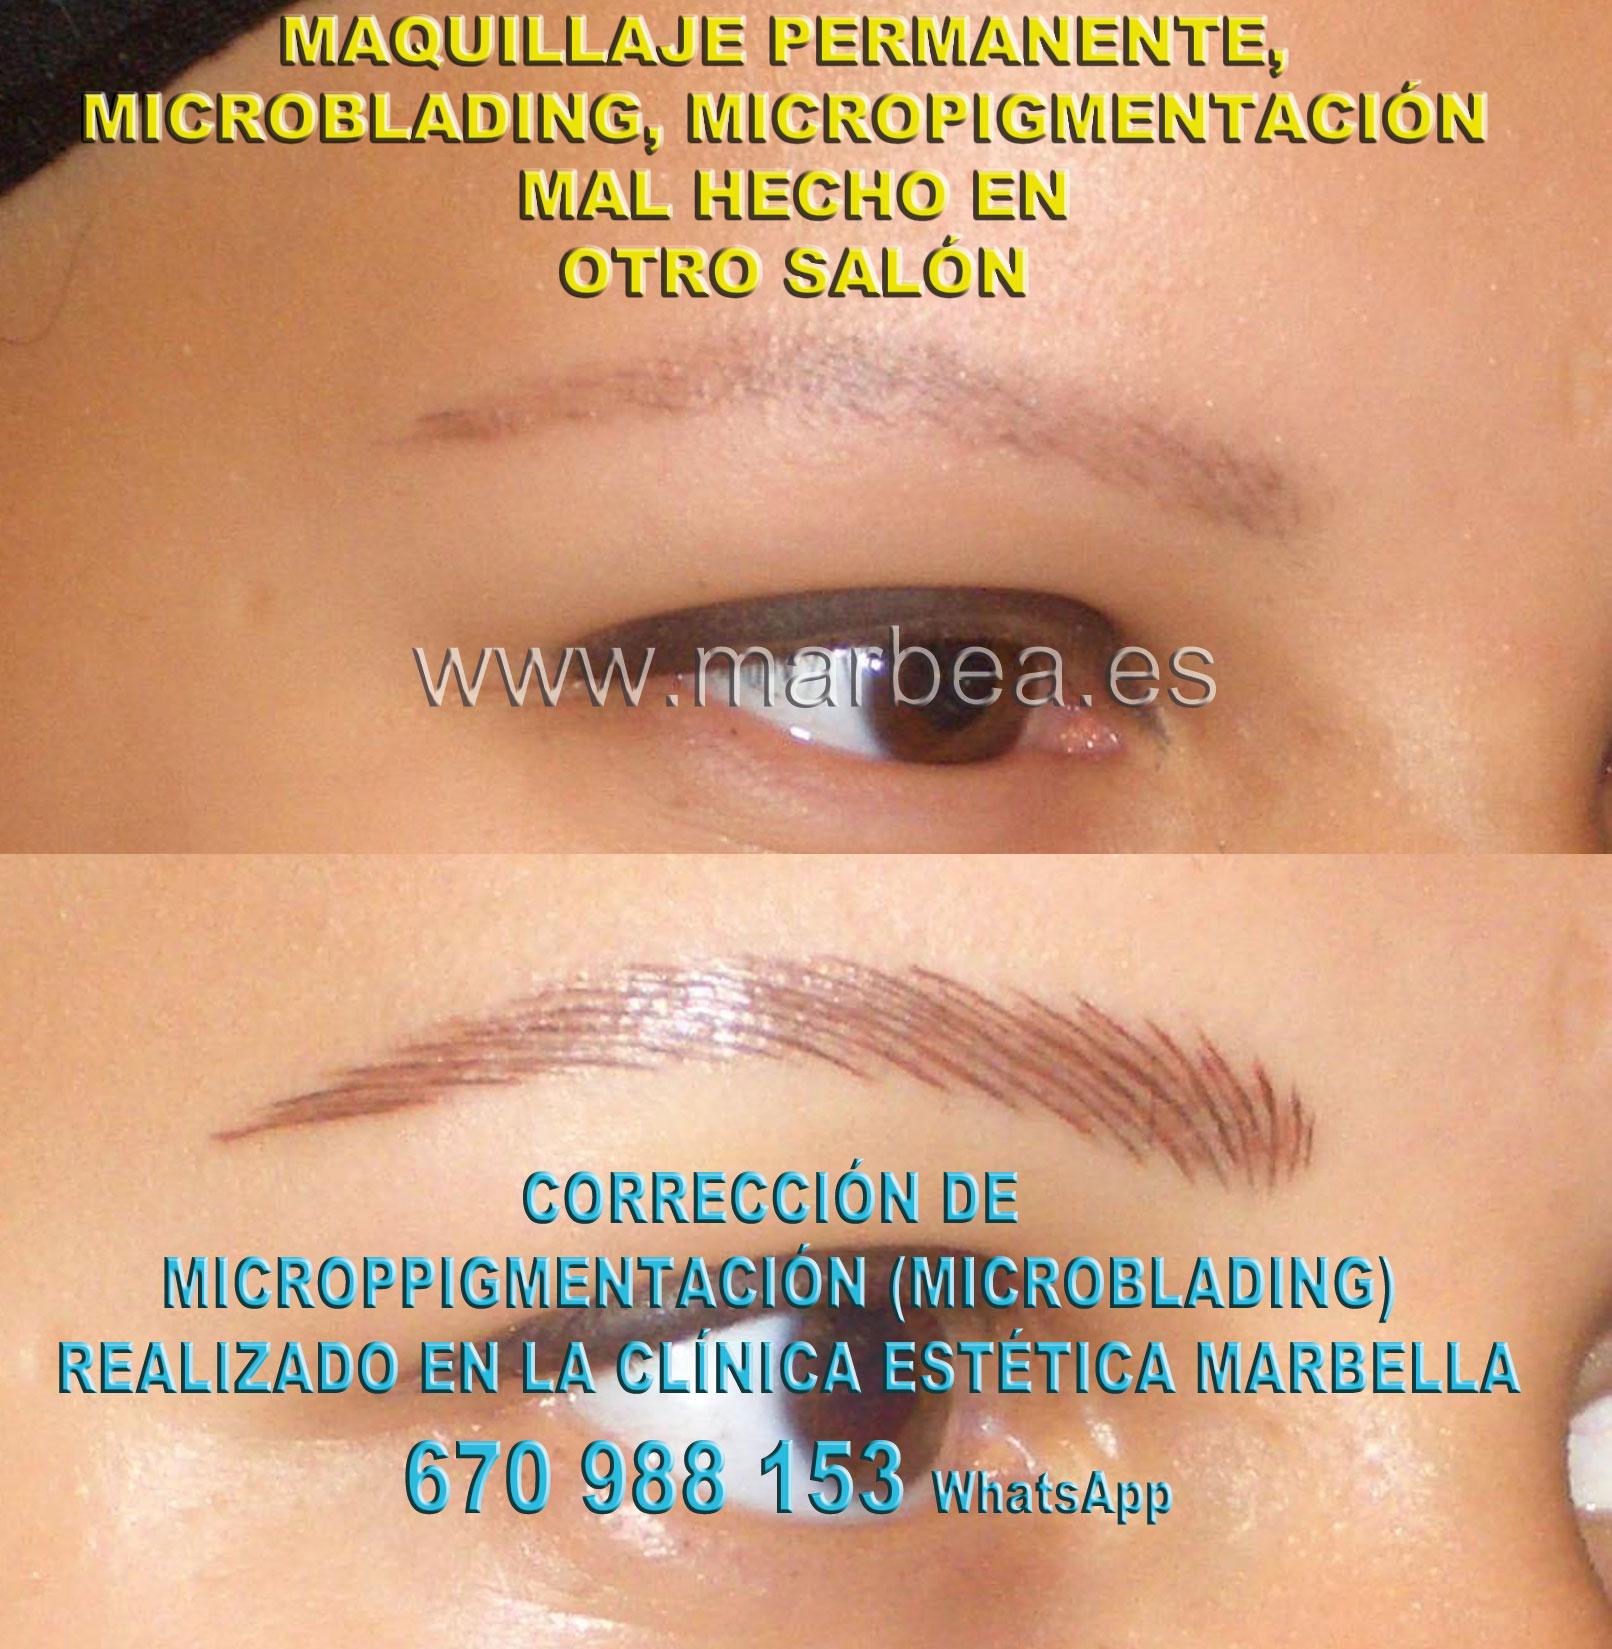 QUITAR TATUAJE CEJAS clínica estética micropigmentación ofrenda micropigmentacion correctiva de cejas,micropigmentación correctiva cejas mal hecha